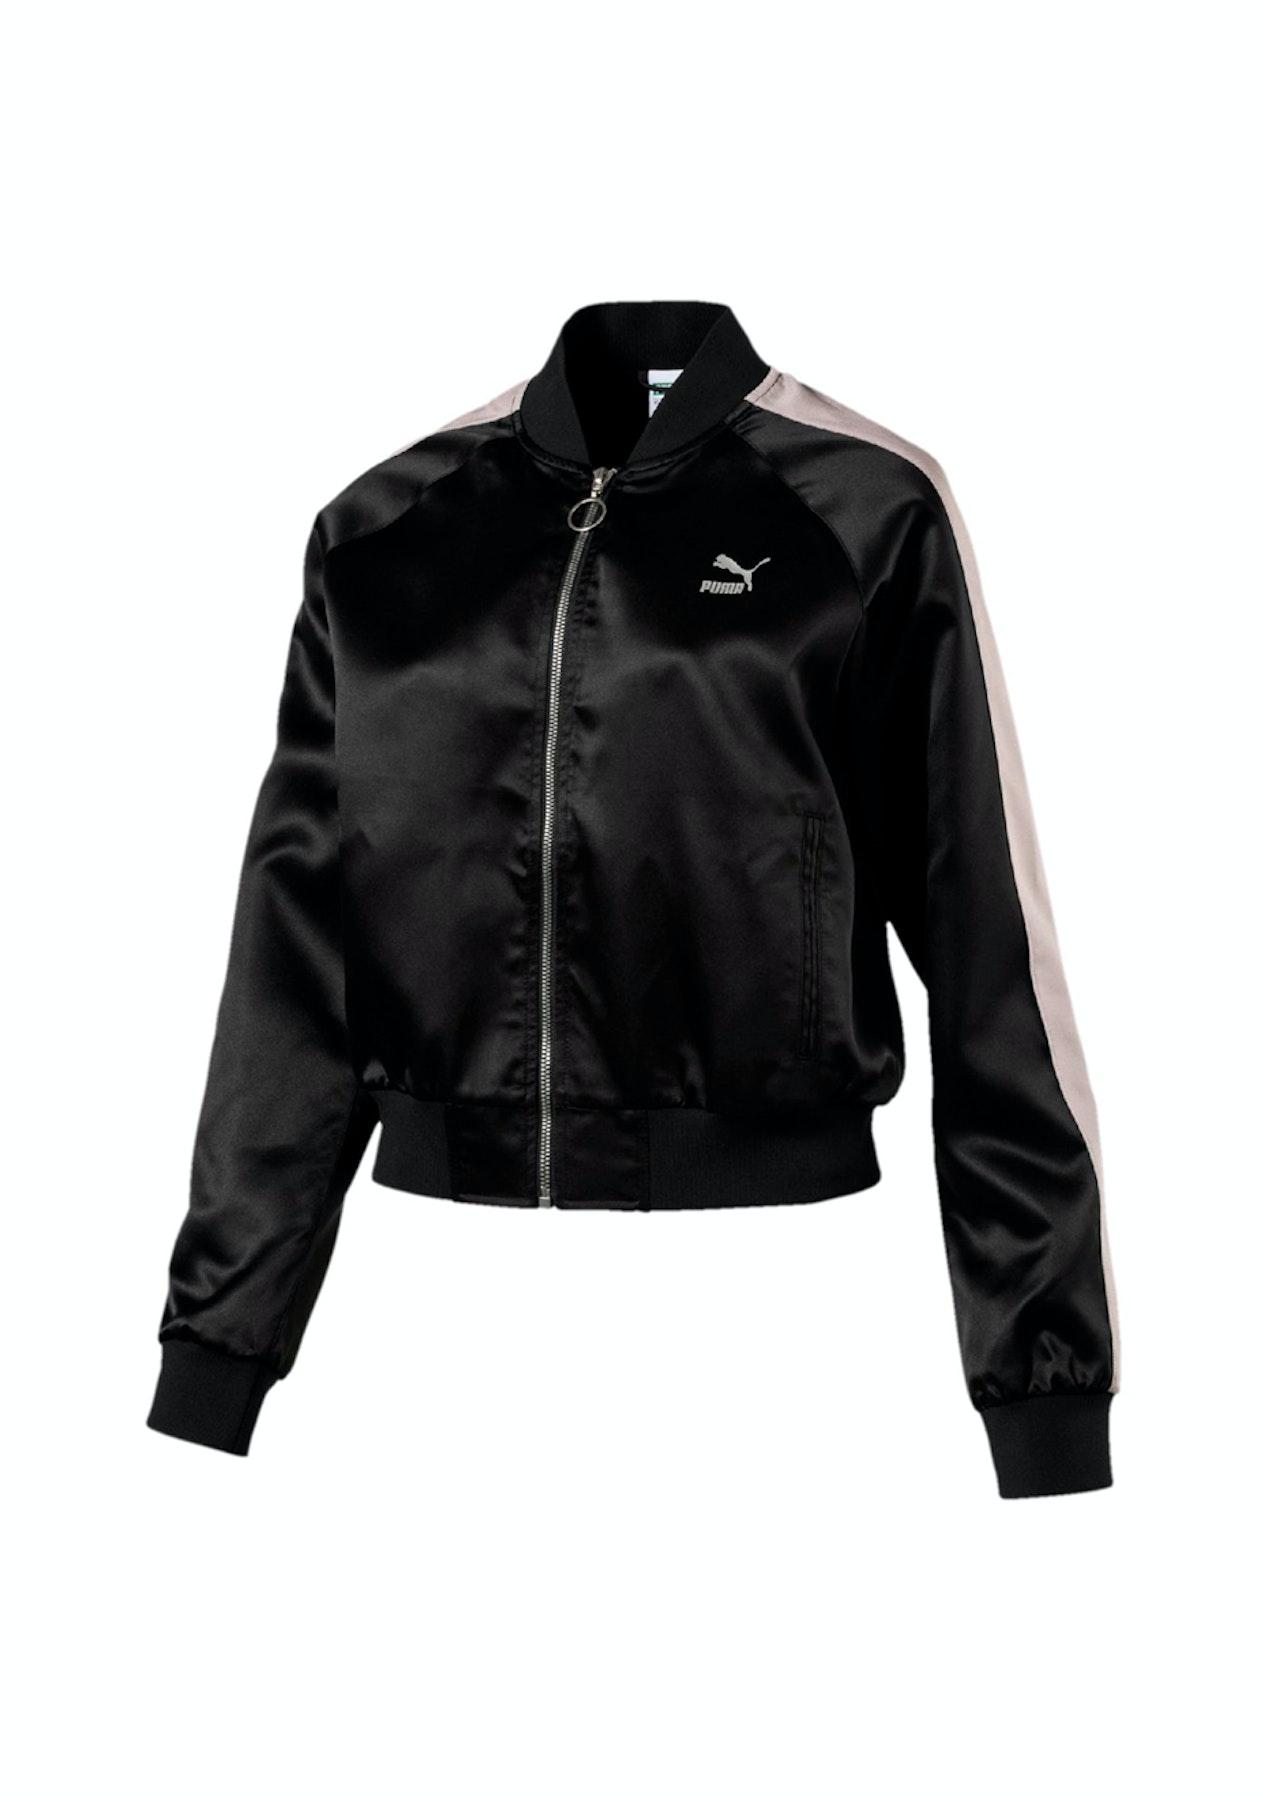 79128a6dacfa Puma Womens - En Pointe Satin T7 Jacket - Black - Under  50 Onceit s gone  it s gone - Onceit